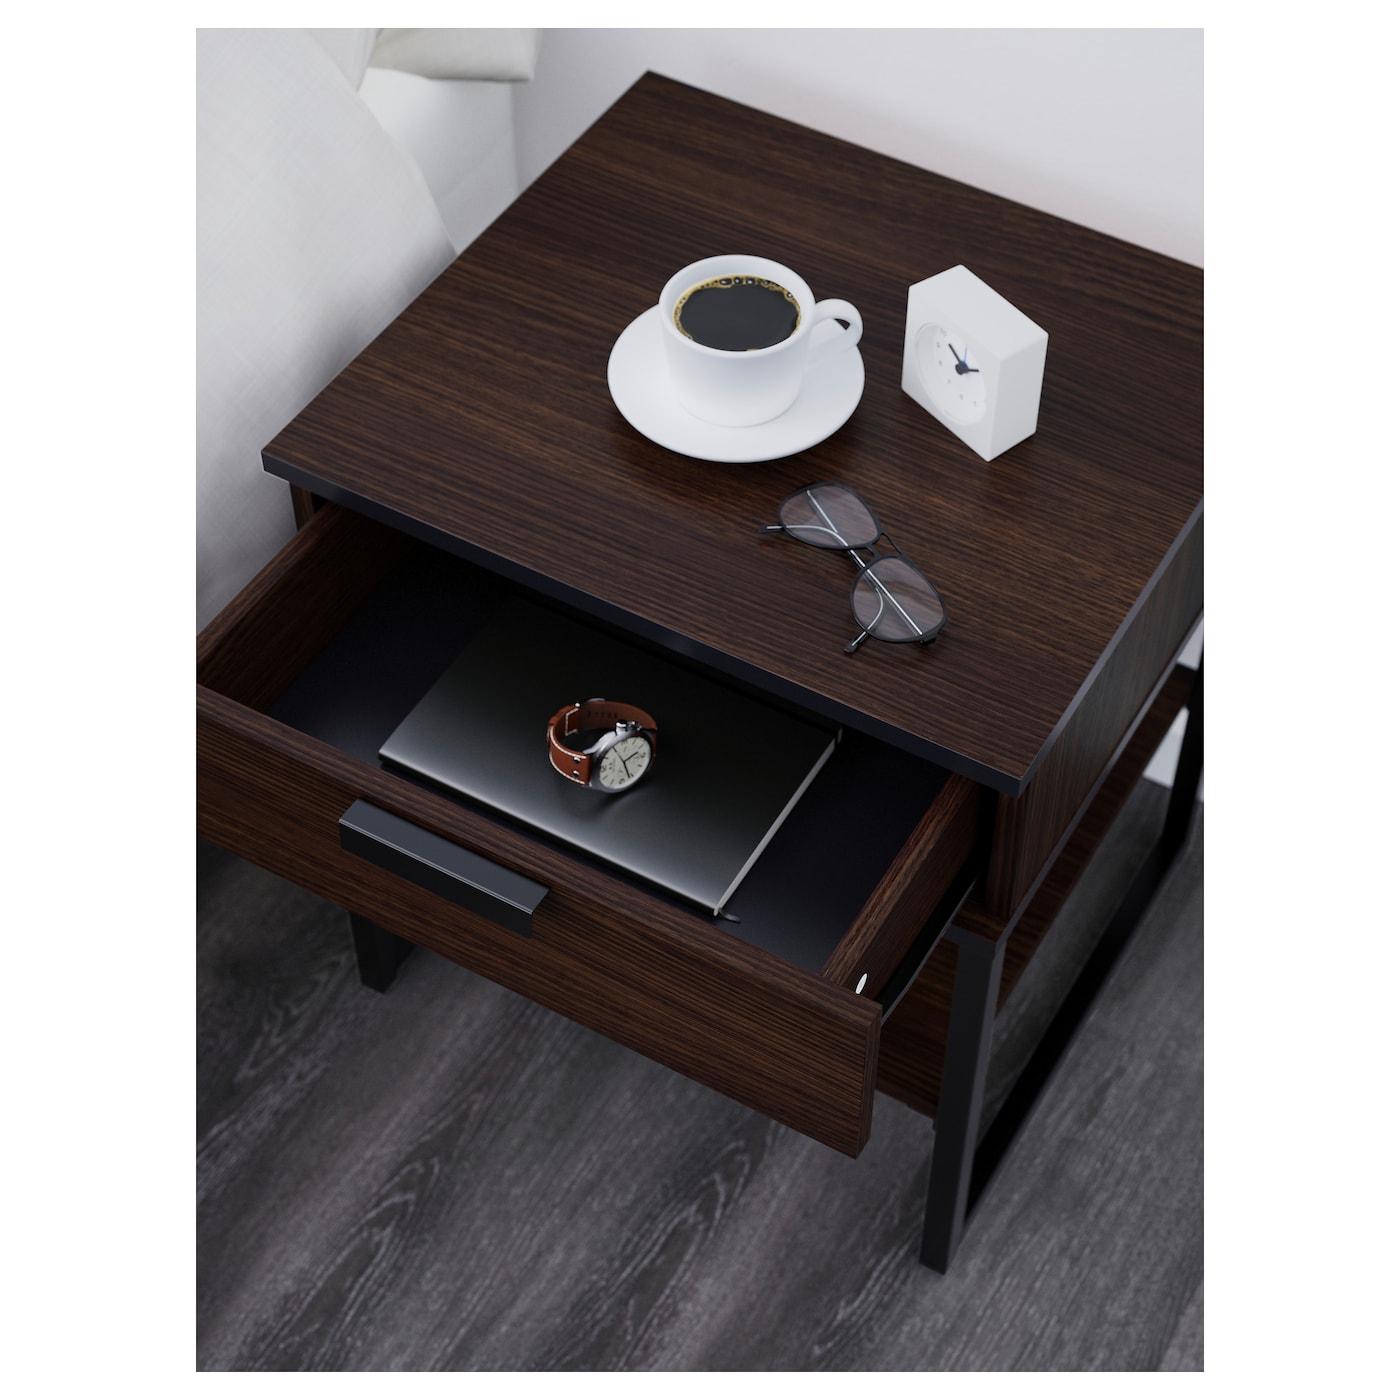 Hemnes Side Table Black Brown 55x55 Cm: TRYSIL Bedside Table Dark Brown/black 45x40 Cm